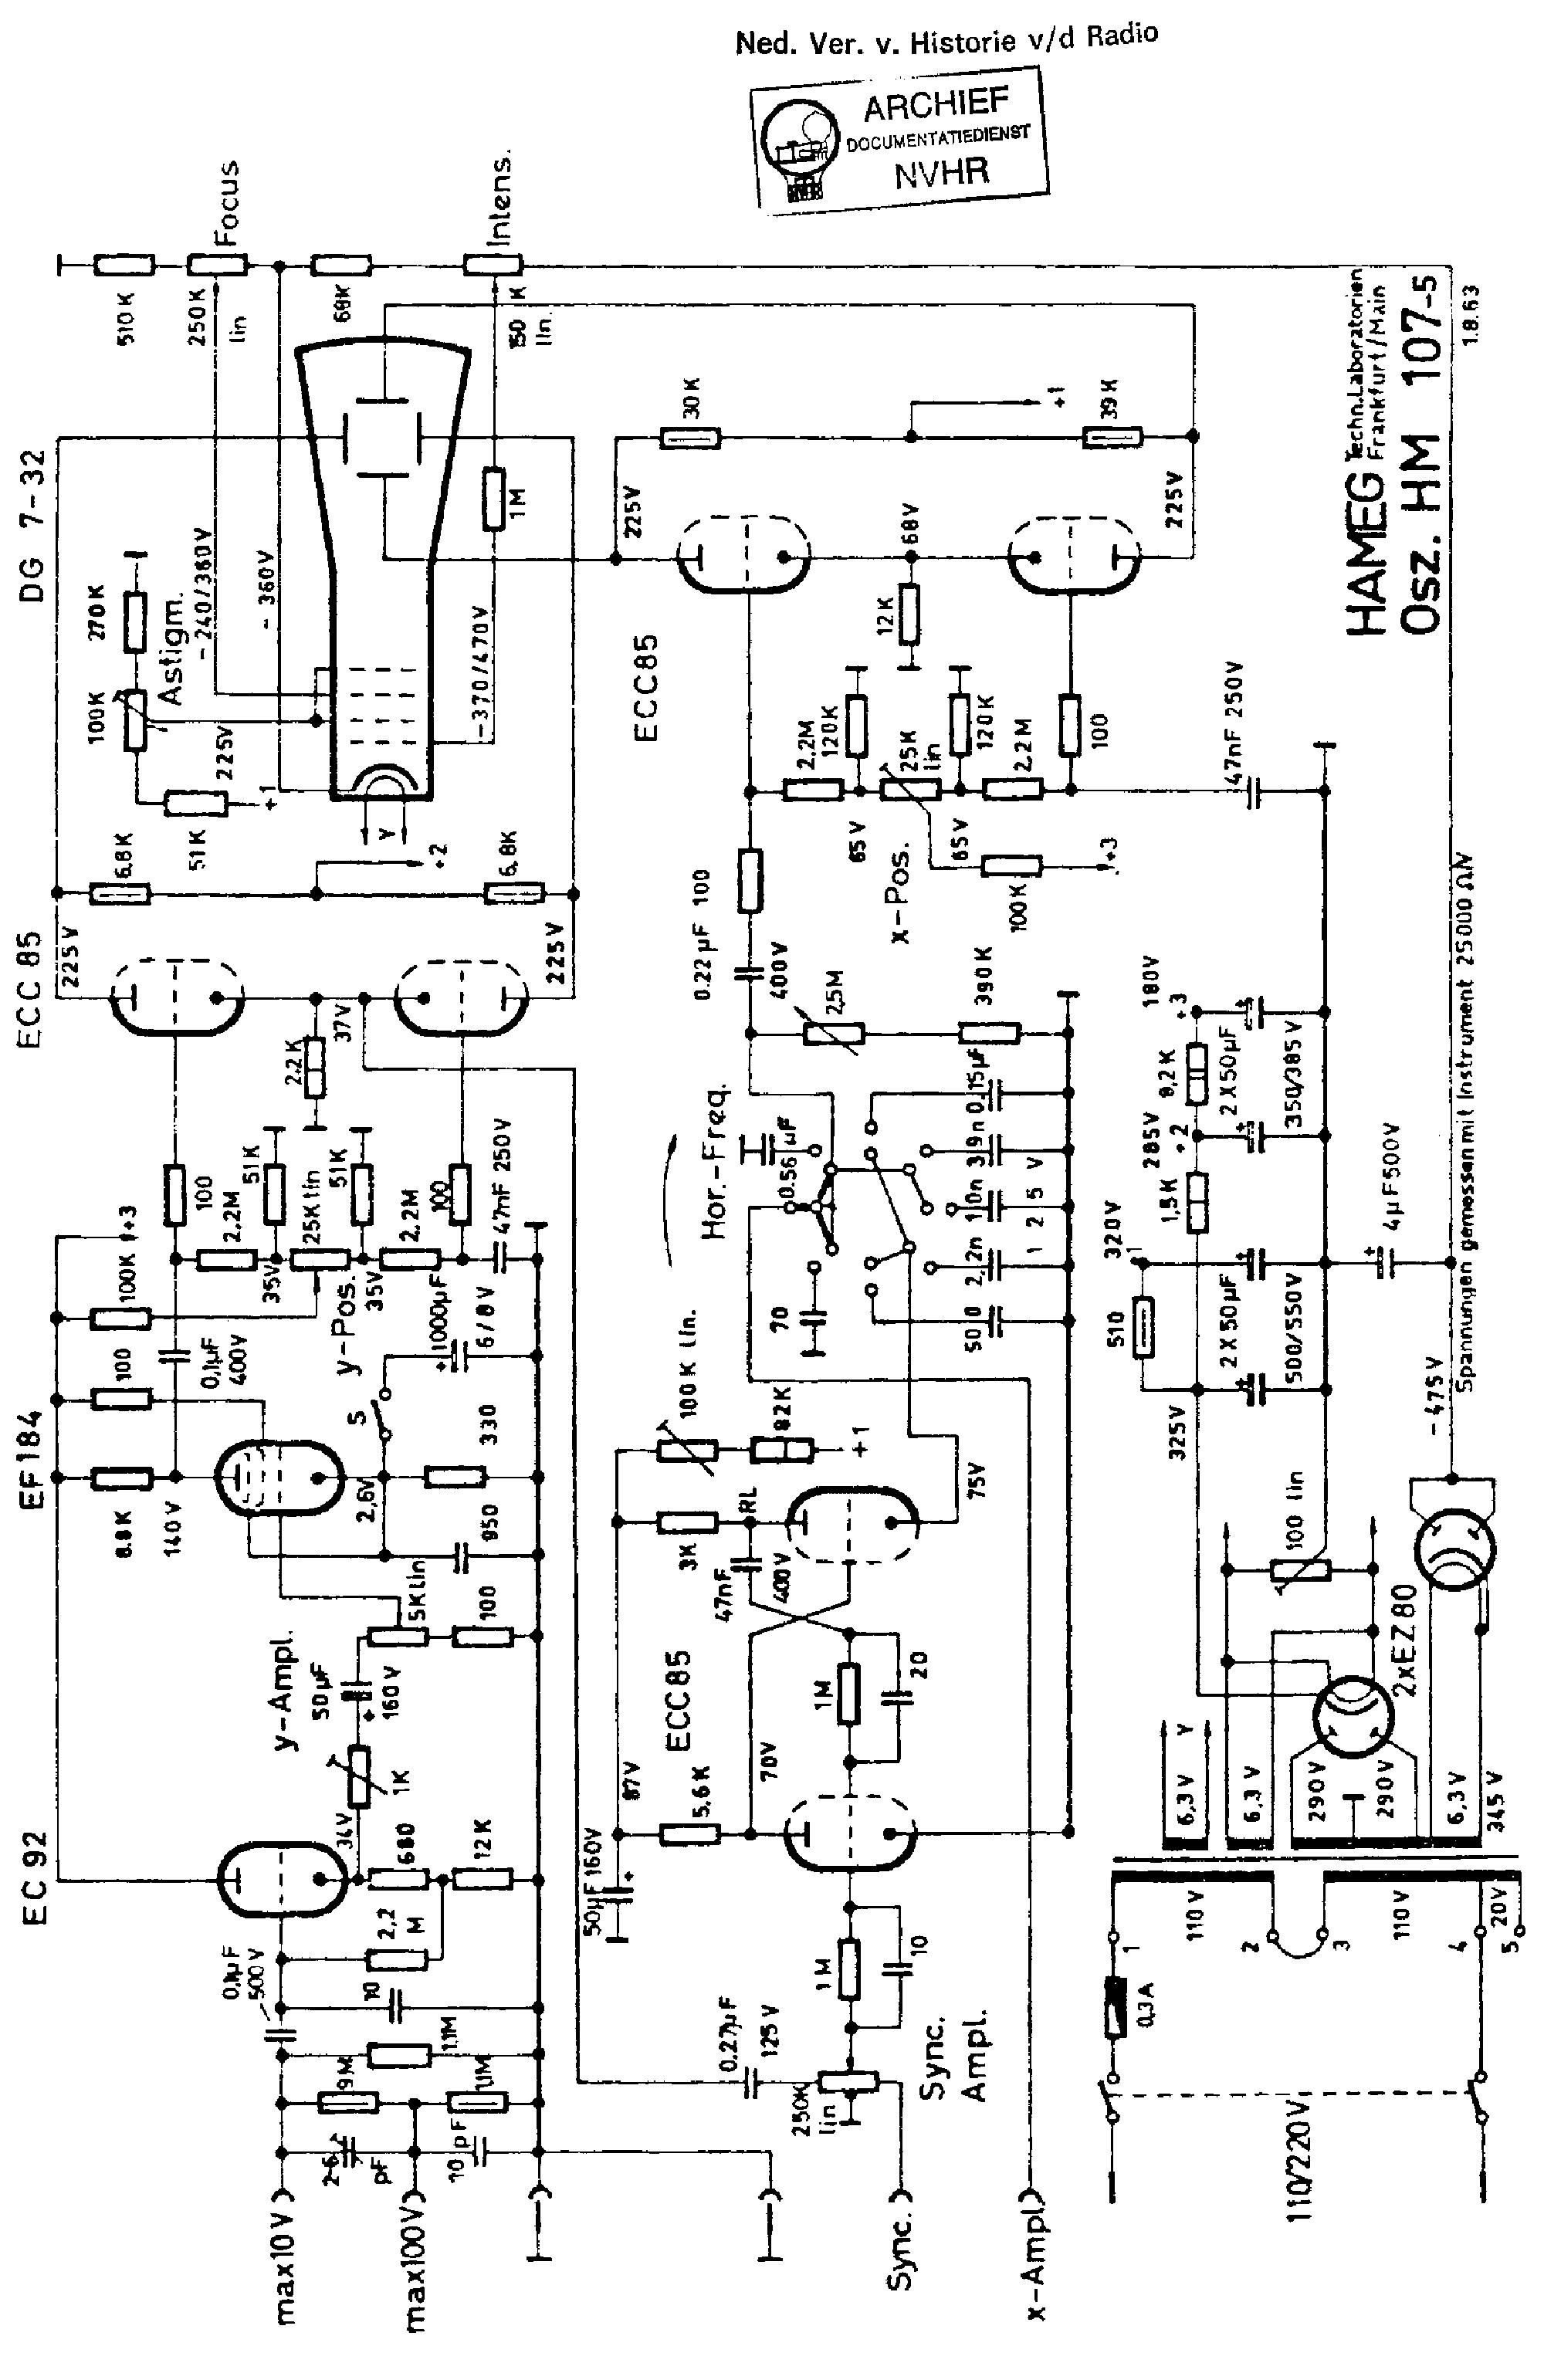 hameg hm107 60mv 5mhz oscilloscope 1963 sch service manual